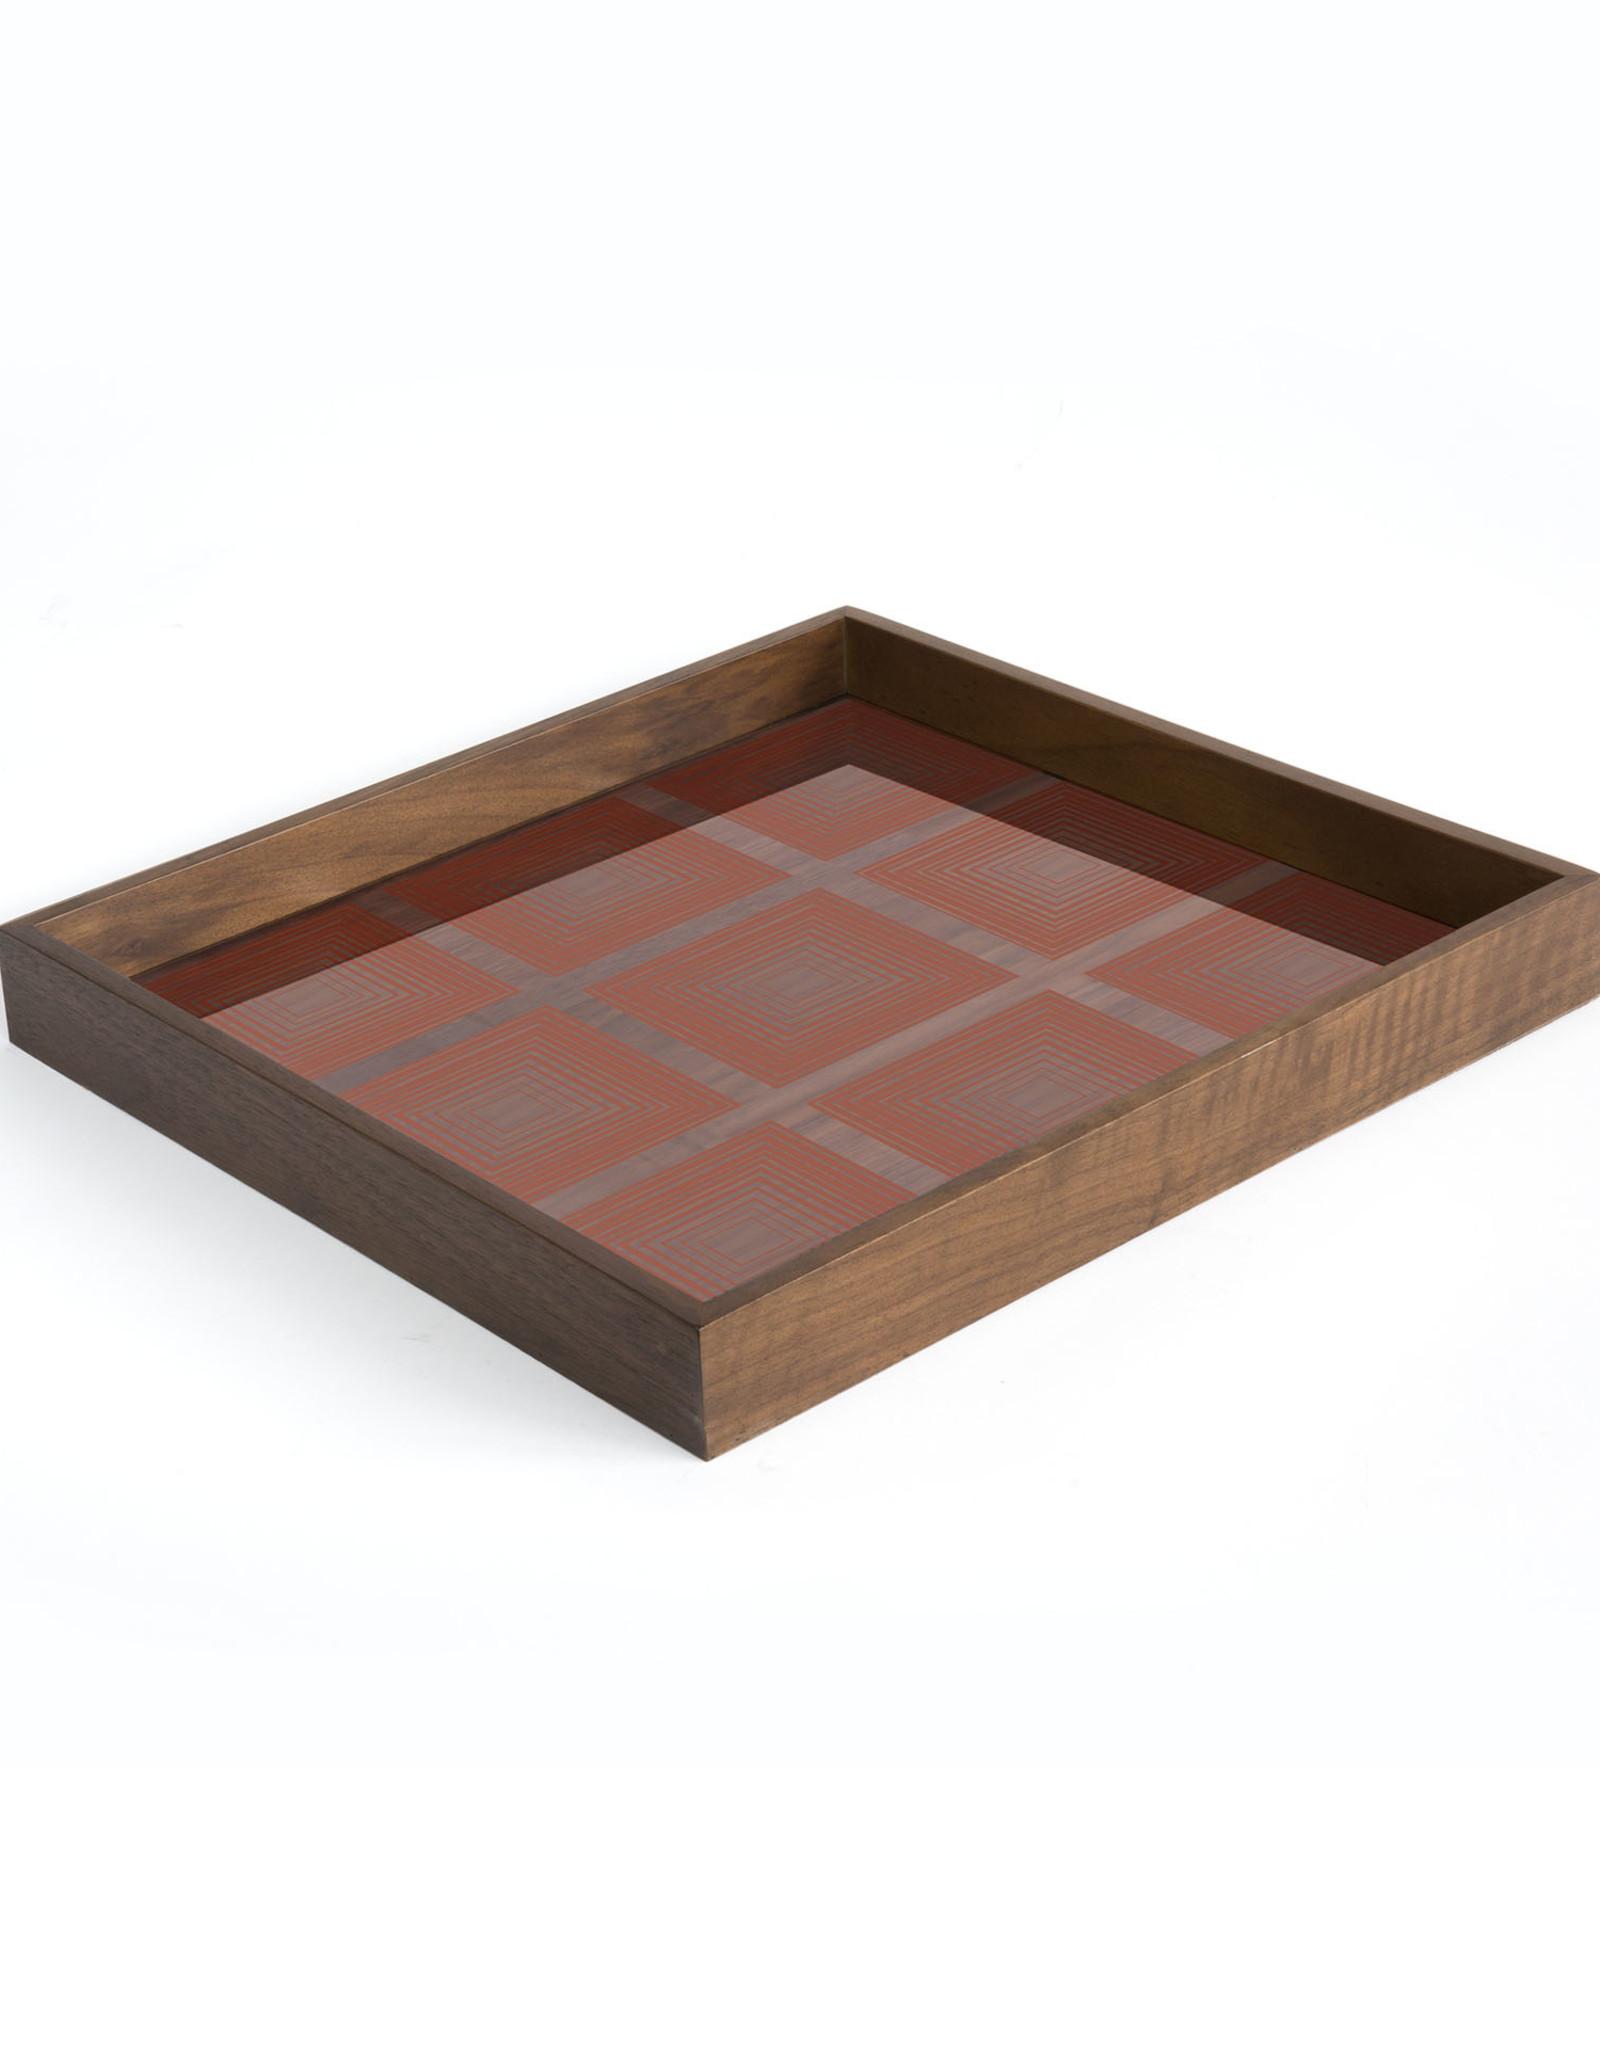 Pumpkin Squares glass tray - square - S 15 x 15 x 2